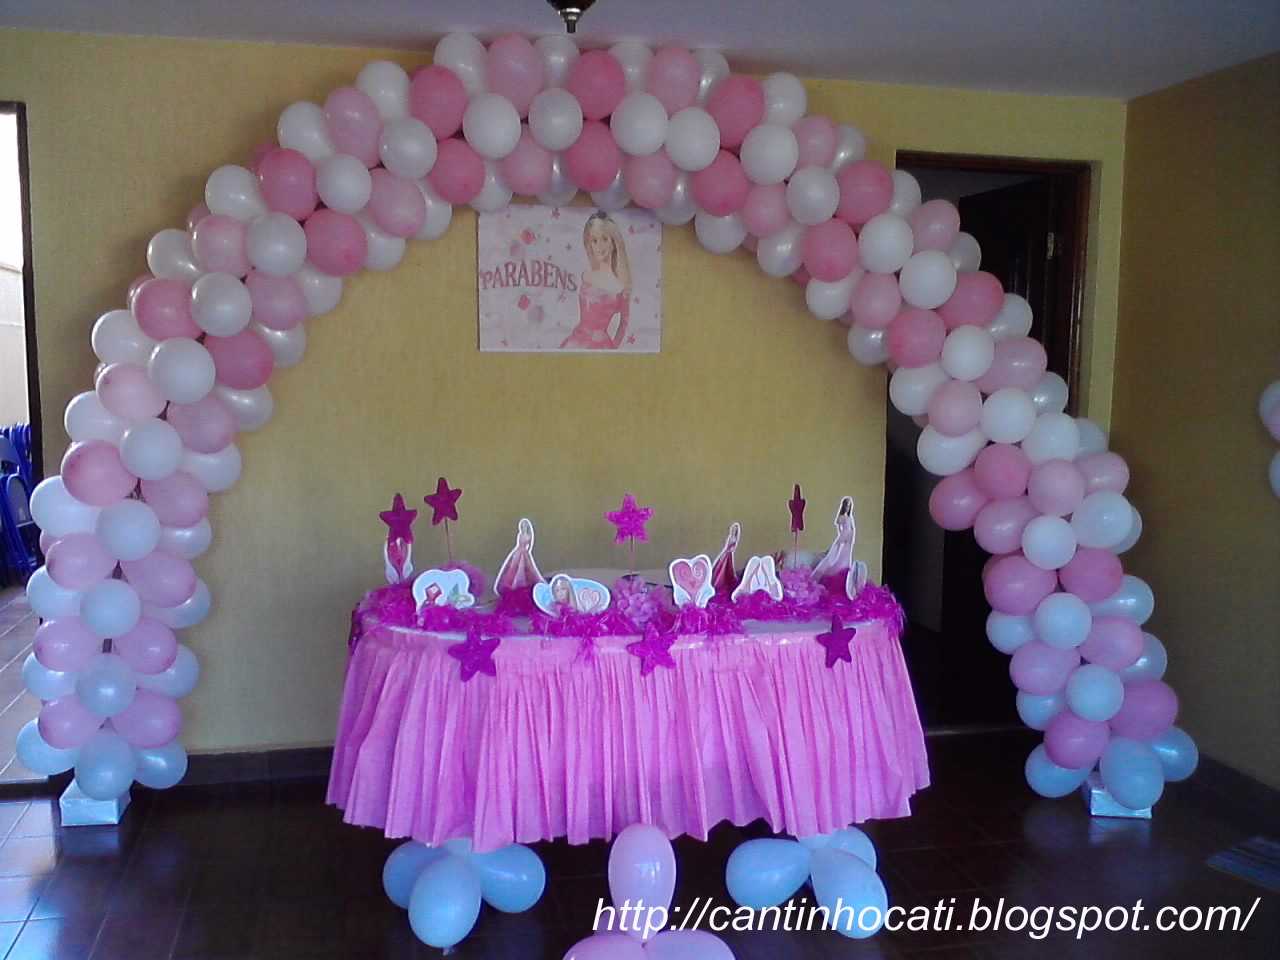 Pin Festa Tema Paris Decora Ajilbabcom Portal Picture on Pinterest #1C5DAF 1280x960 Banheiro Da Barbie Mercadolivre